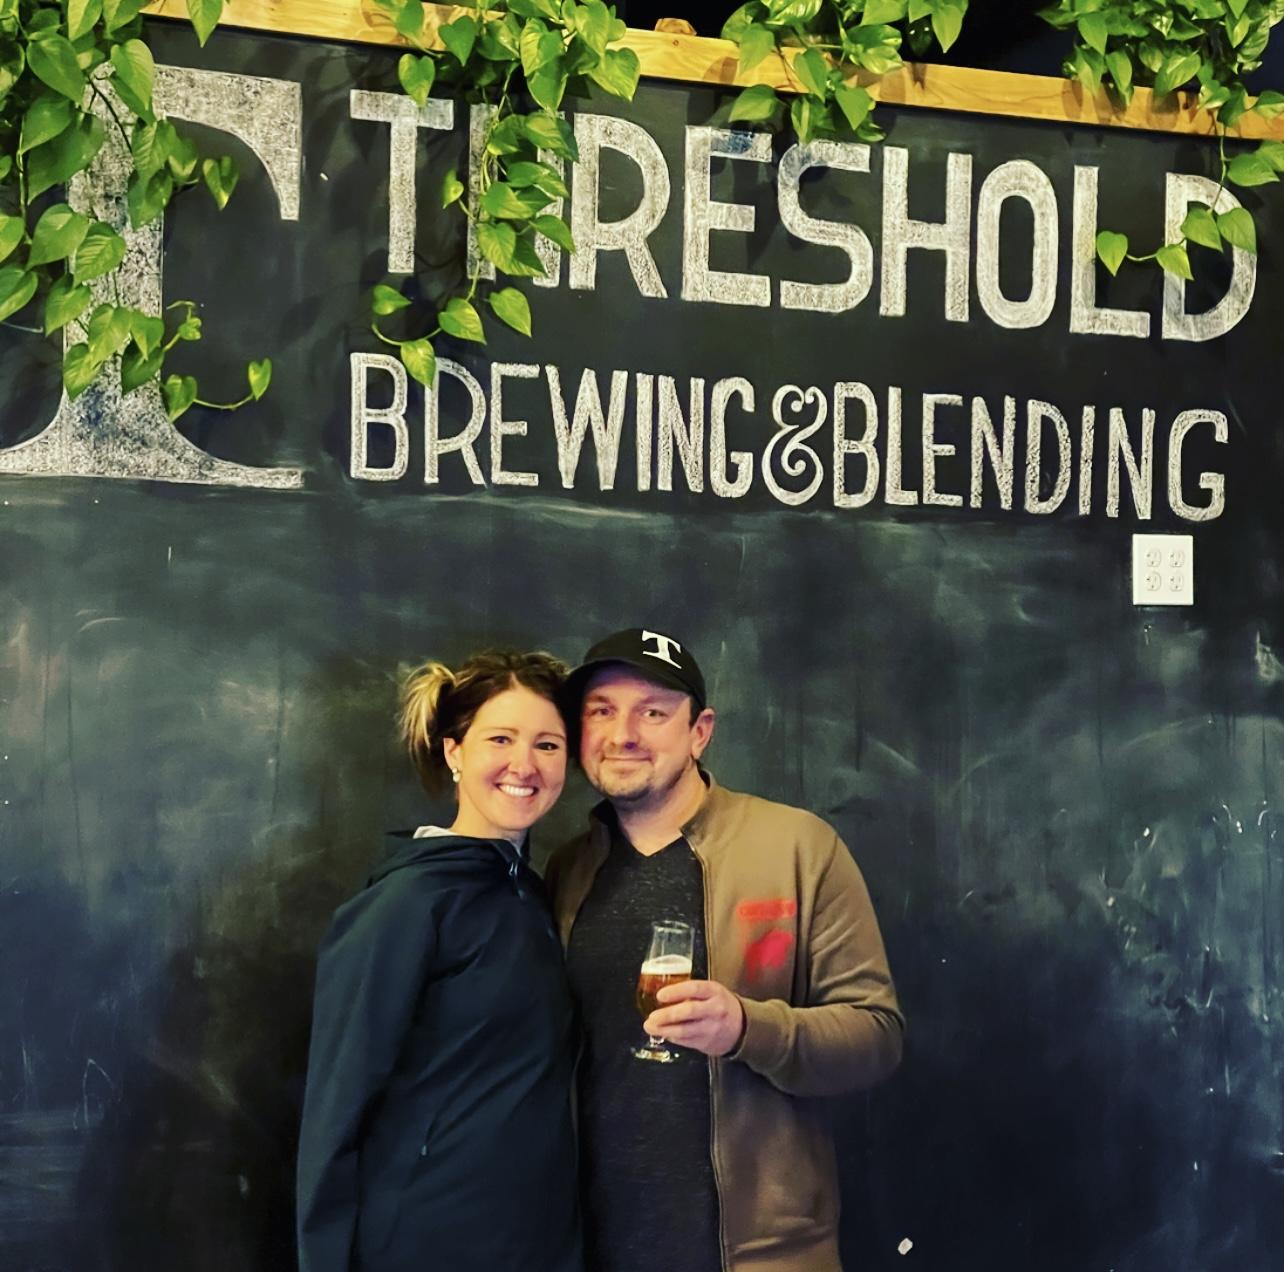 Jarek Szymanski Threshold Brewing & Blending – Craft Beer Podcast Episode 131 by Steven Shomler